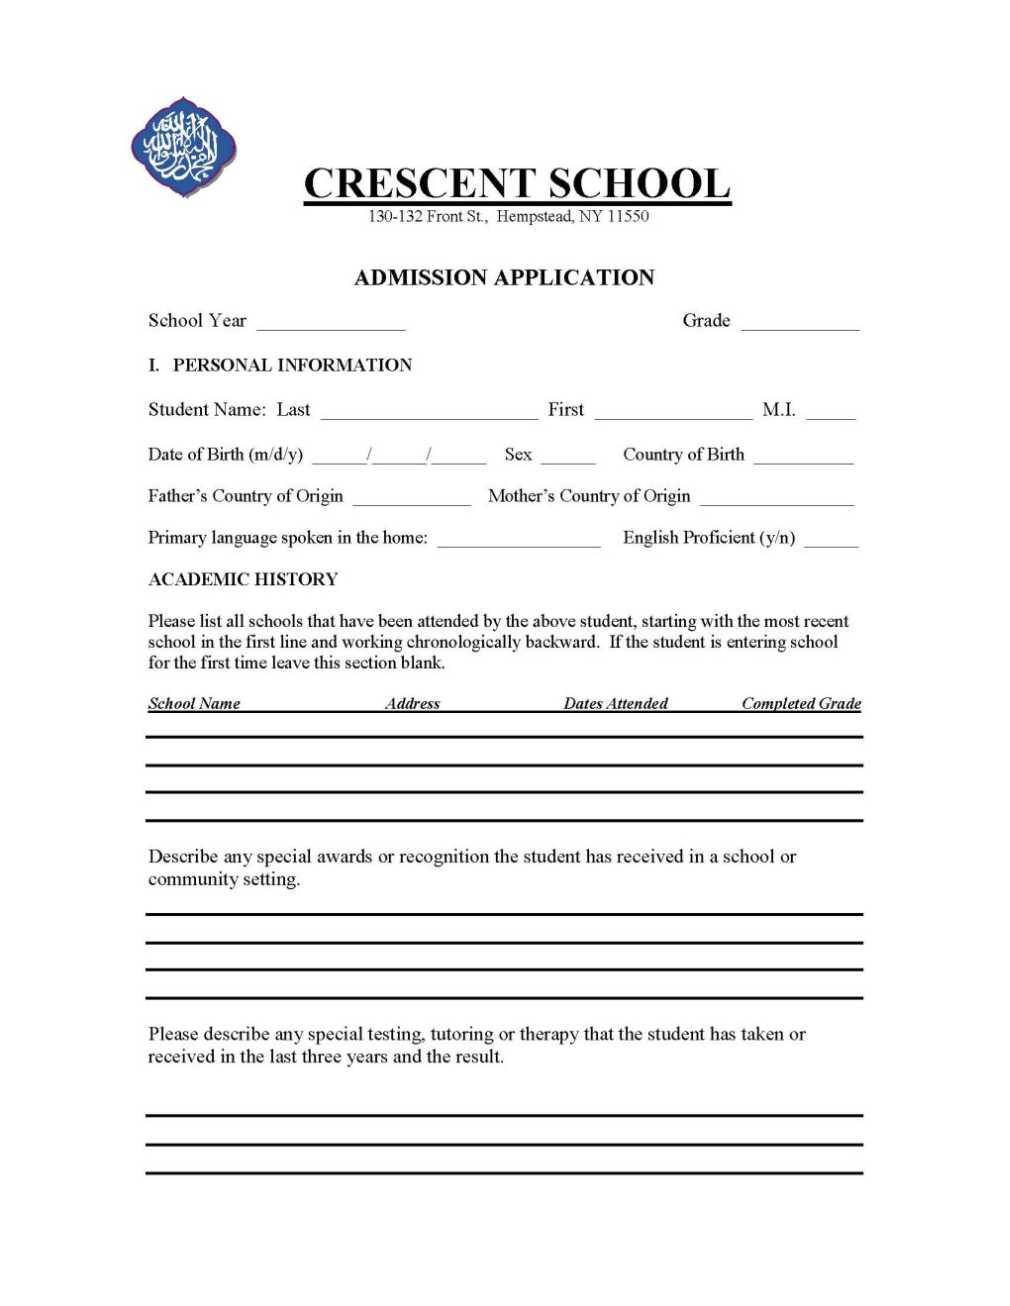 New York State Birth Certificate Transcript